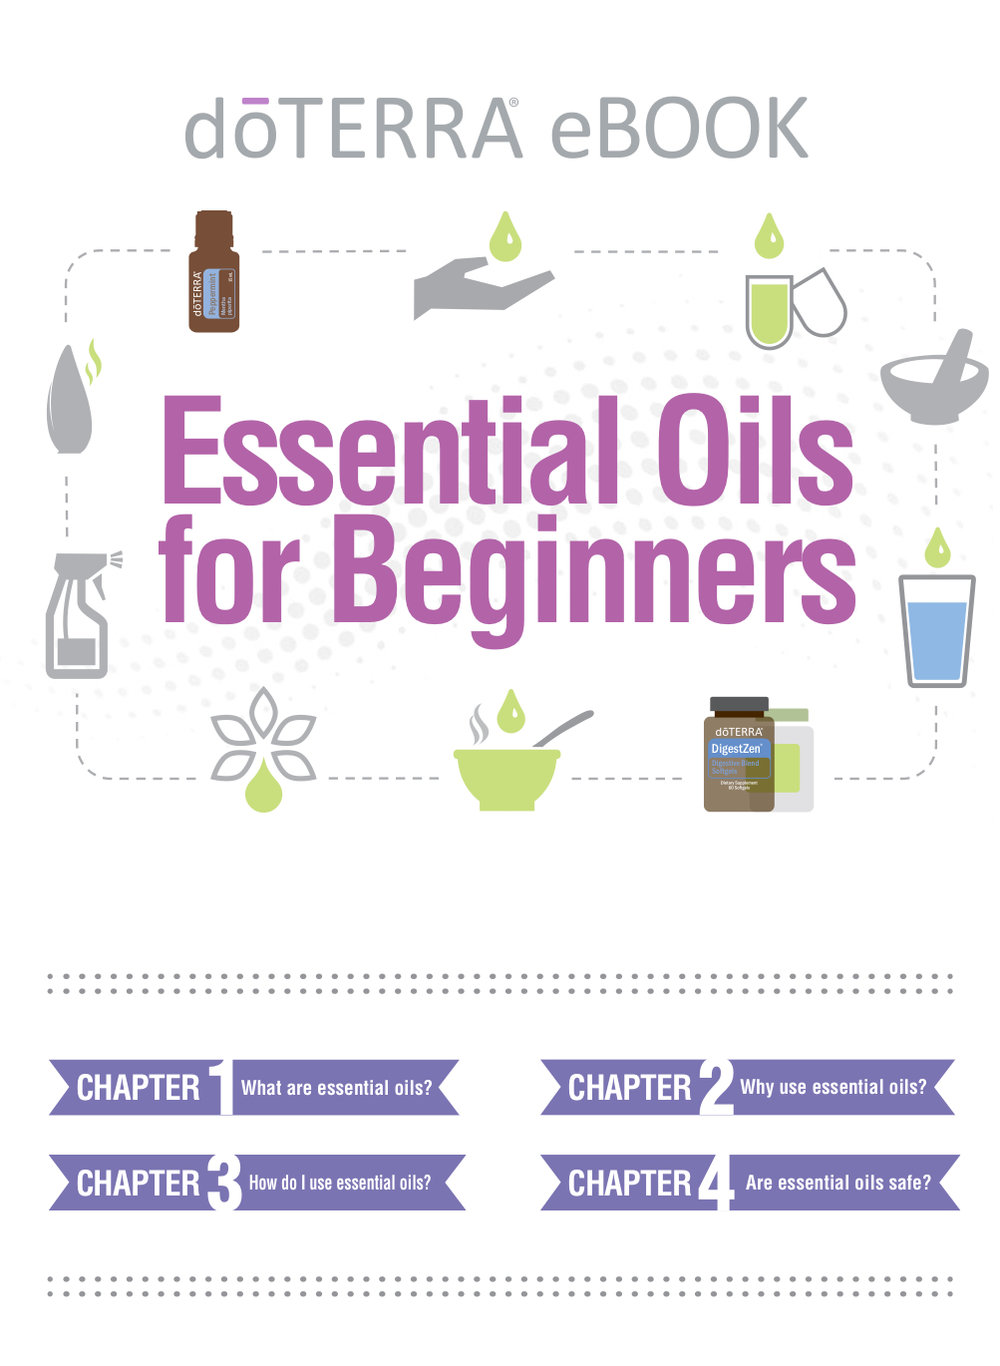 essential oils for beginners.jpg